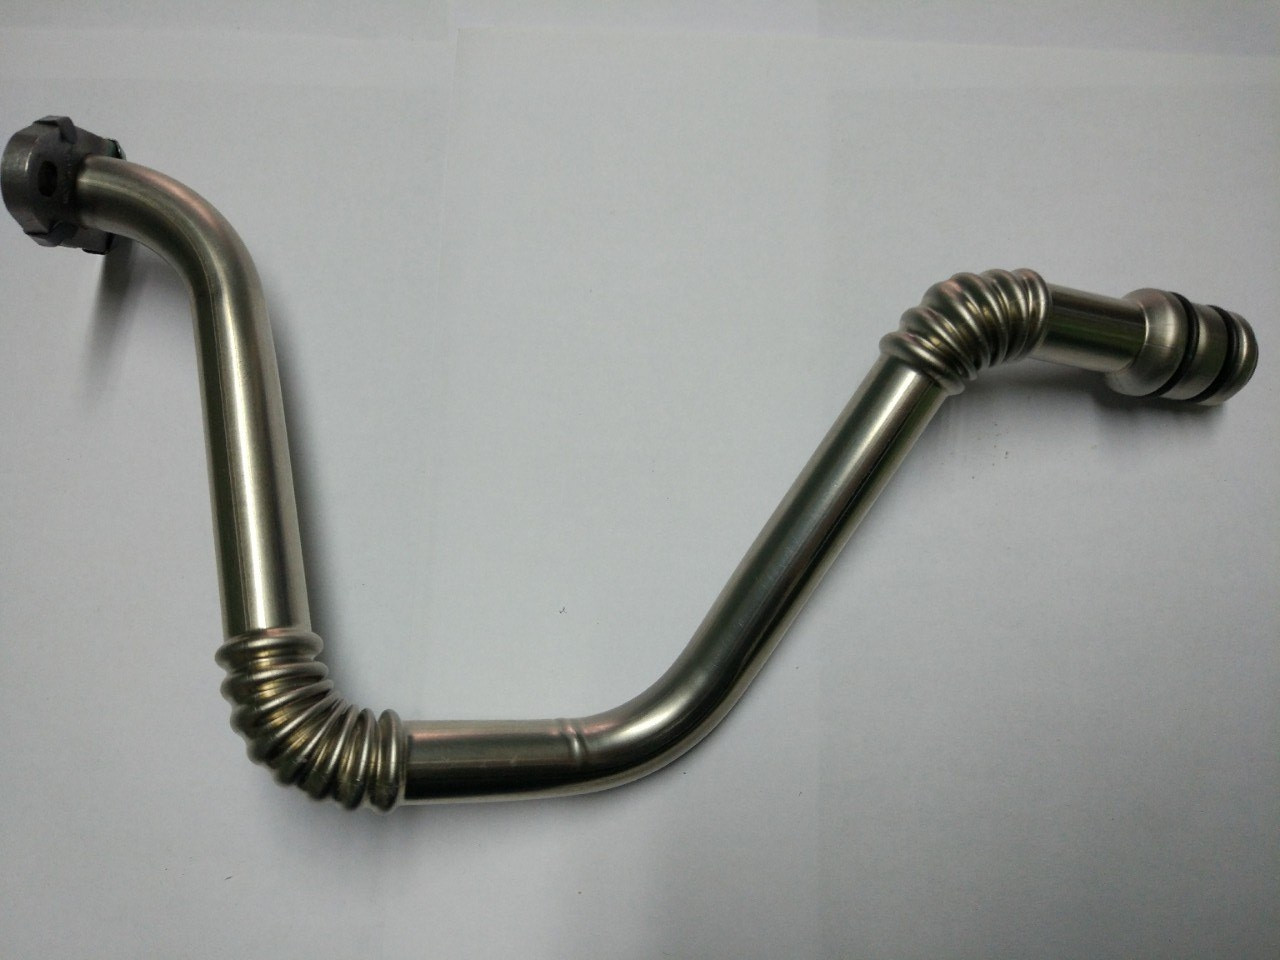 Трубка зливу масла турбіни Renault Trafic, Opel Vivaro 1.9, 2001-2006, Renault/Nissan 8200502013